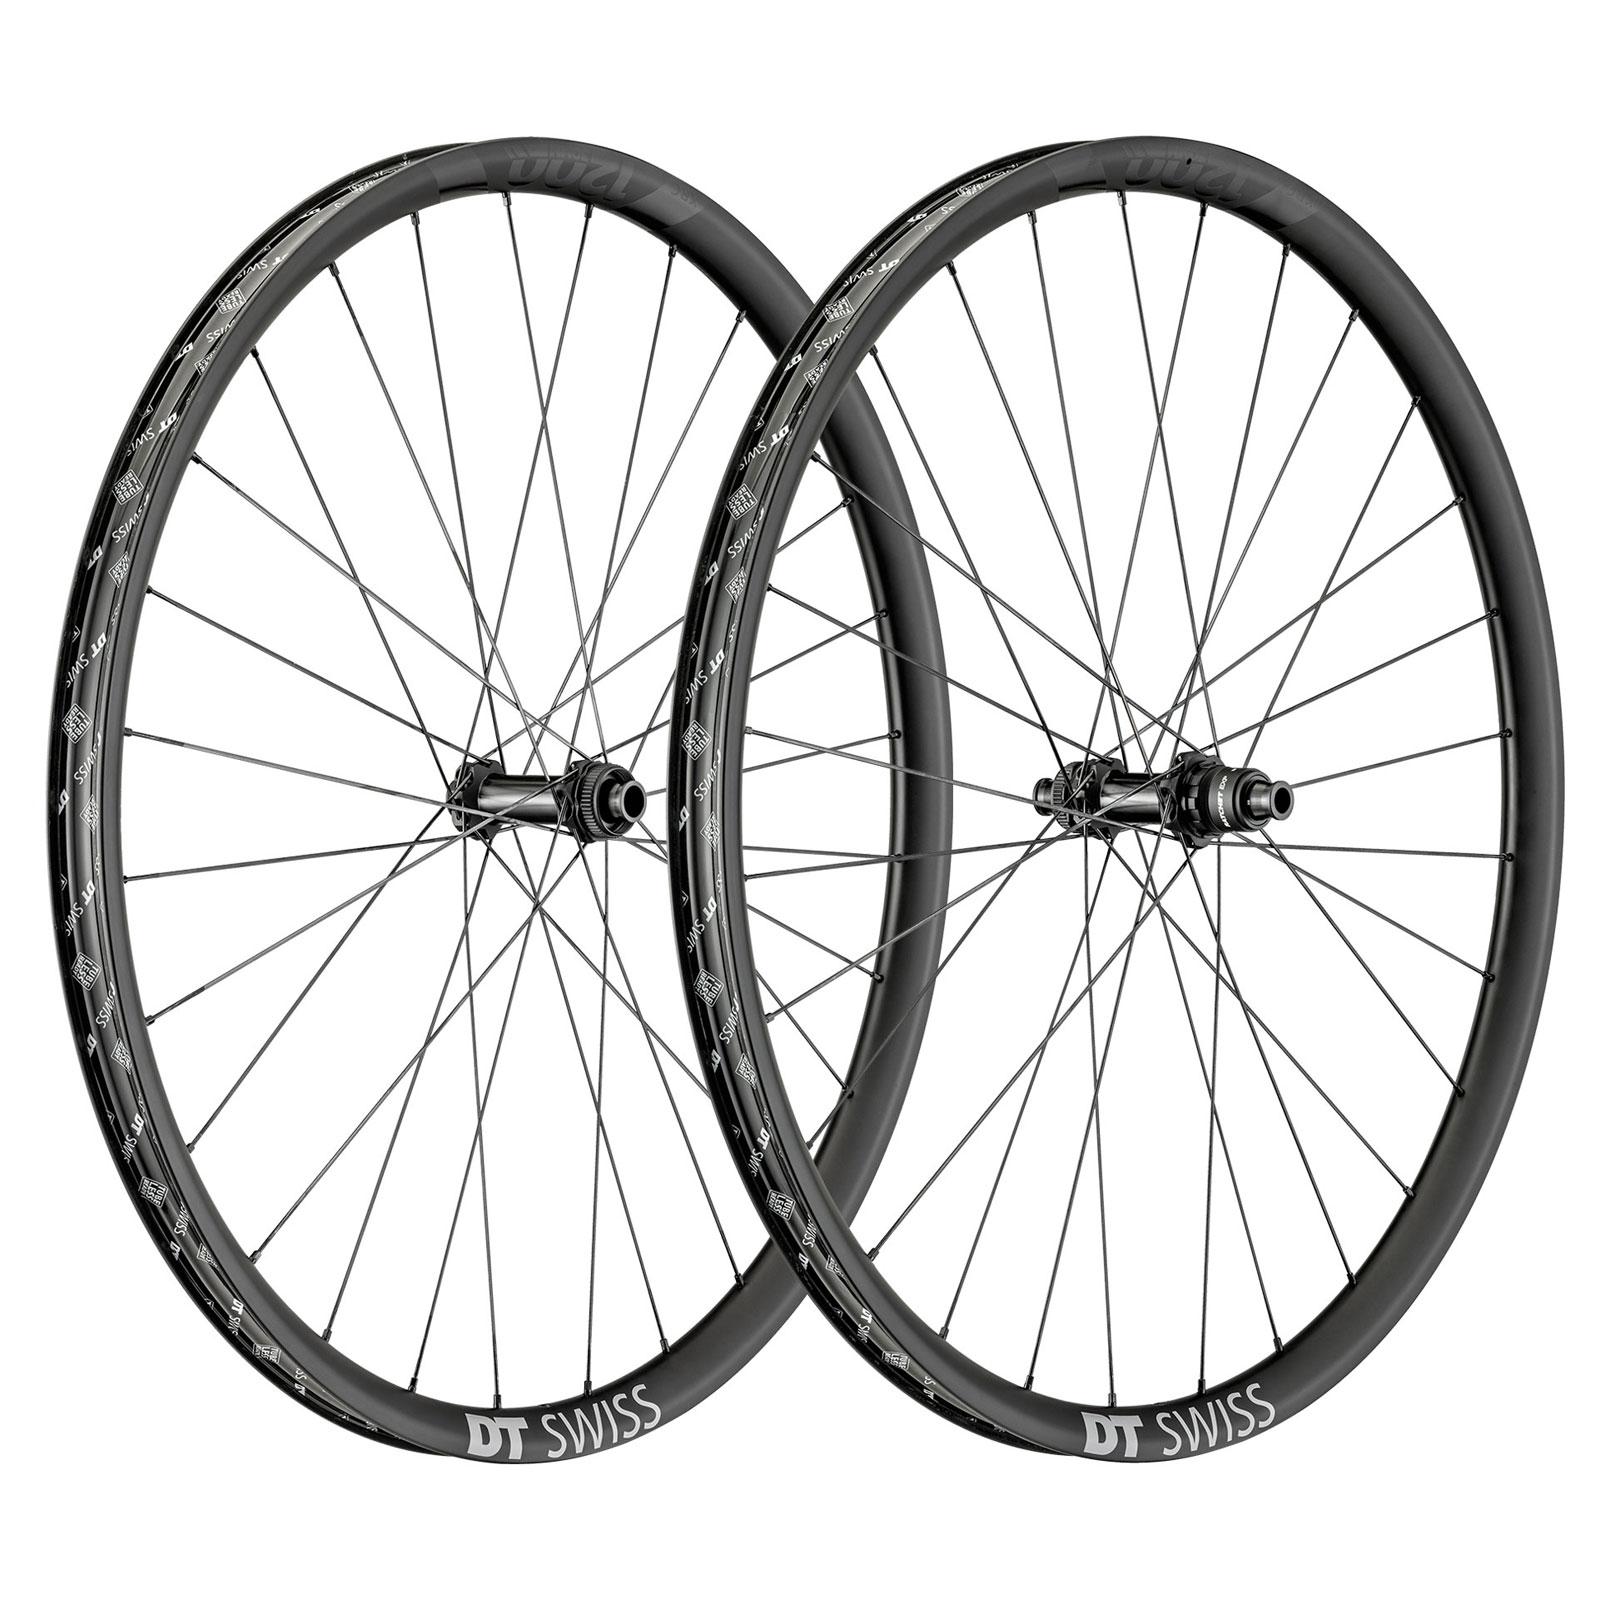 "DT Swiss XRC 1200 SPLINE 25 - Carbon - 29"" Wheelset - Clincher - Centerlock / 6-Bolt - Shimano Micro Spline / SRAM XD - FW: 15x110mm | RW: 12x148mm - Boost"